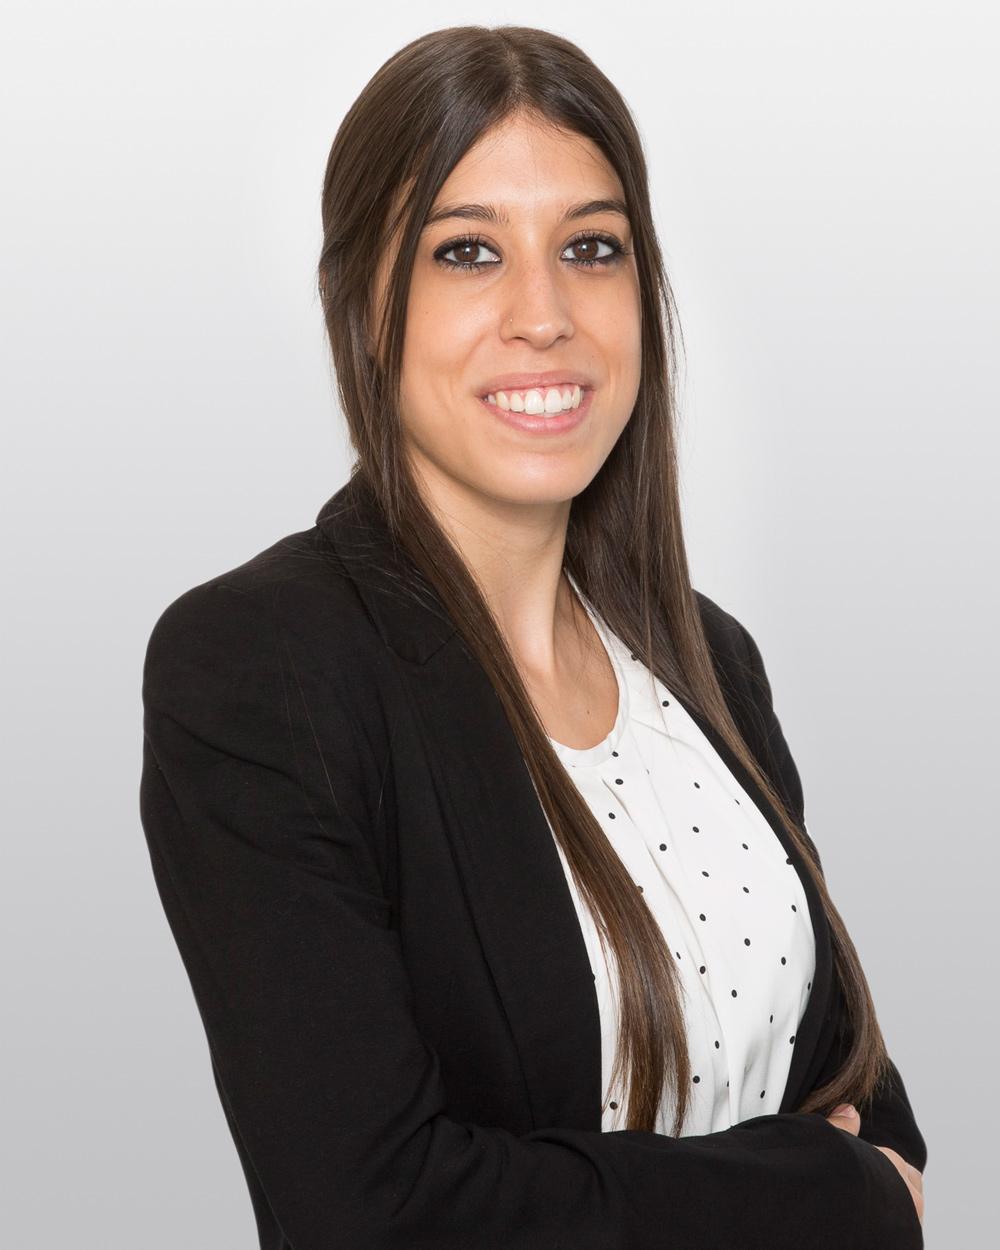 Elena Hernaiz